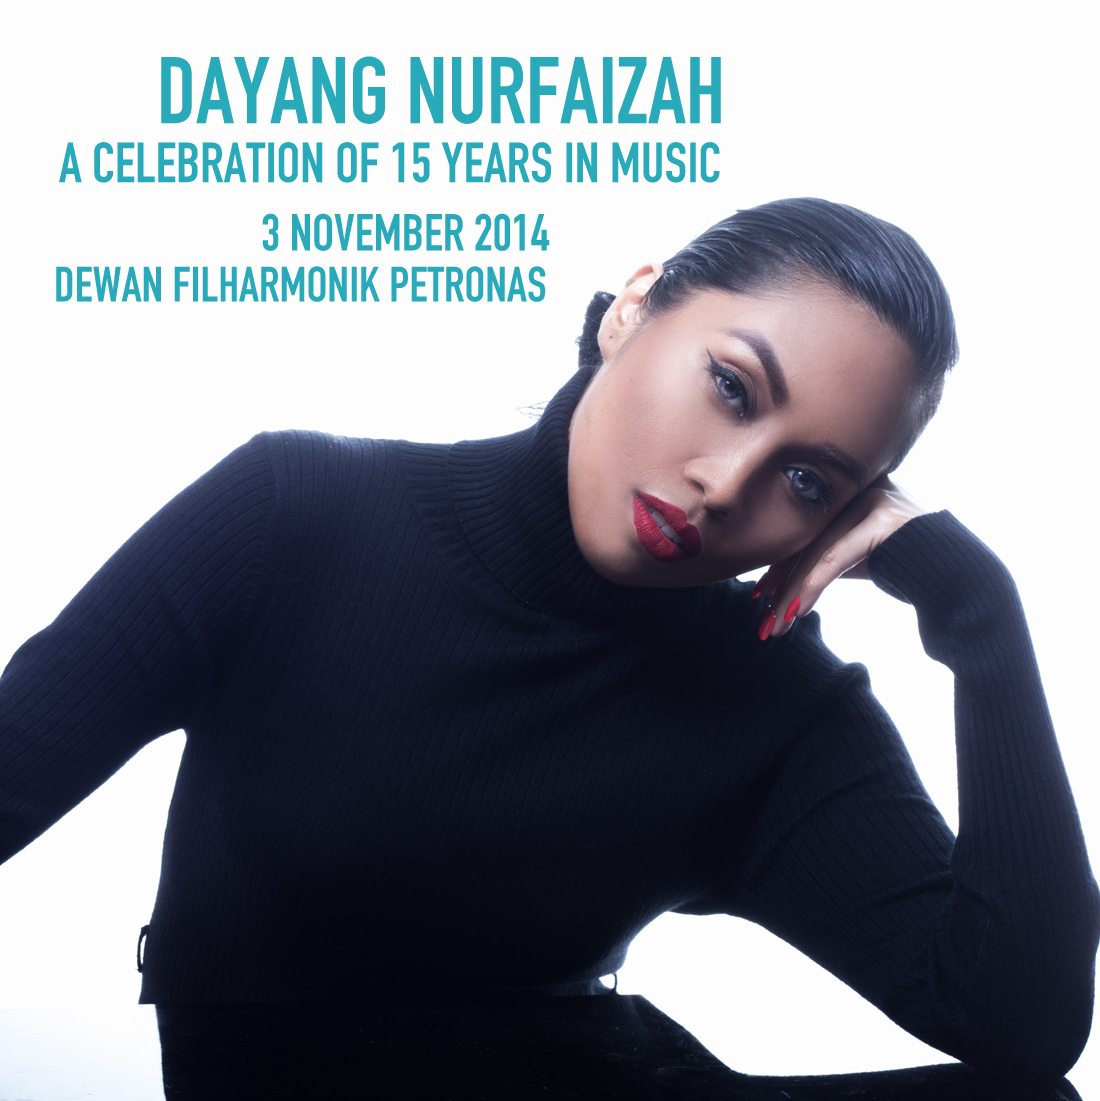 Dayang Nurfaizah – A Celebration of 15 Years in Music